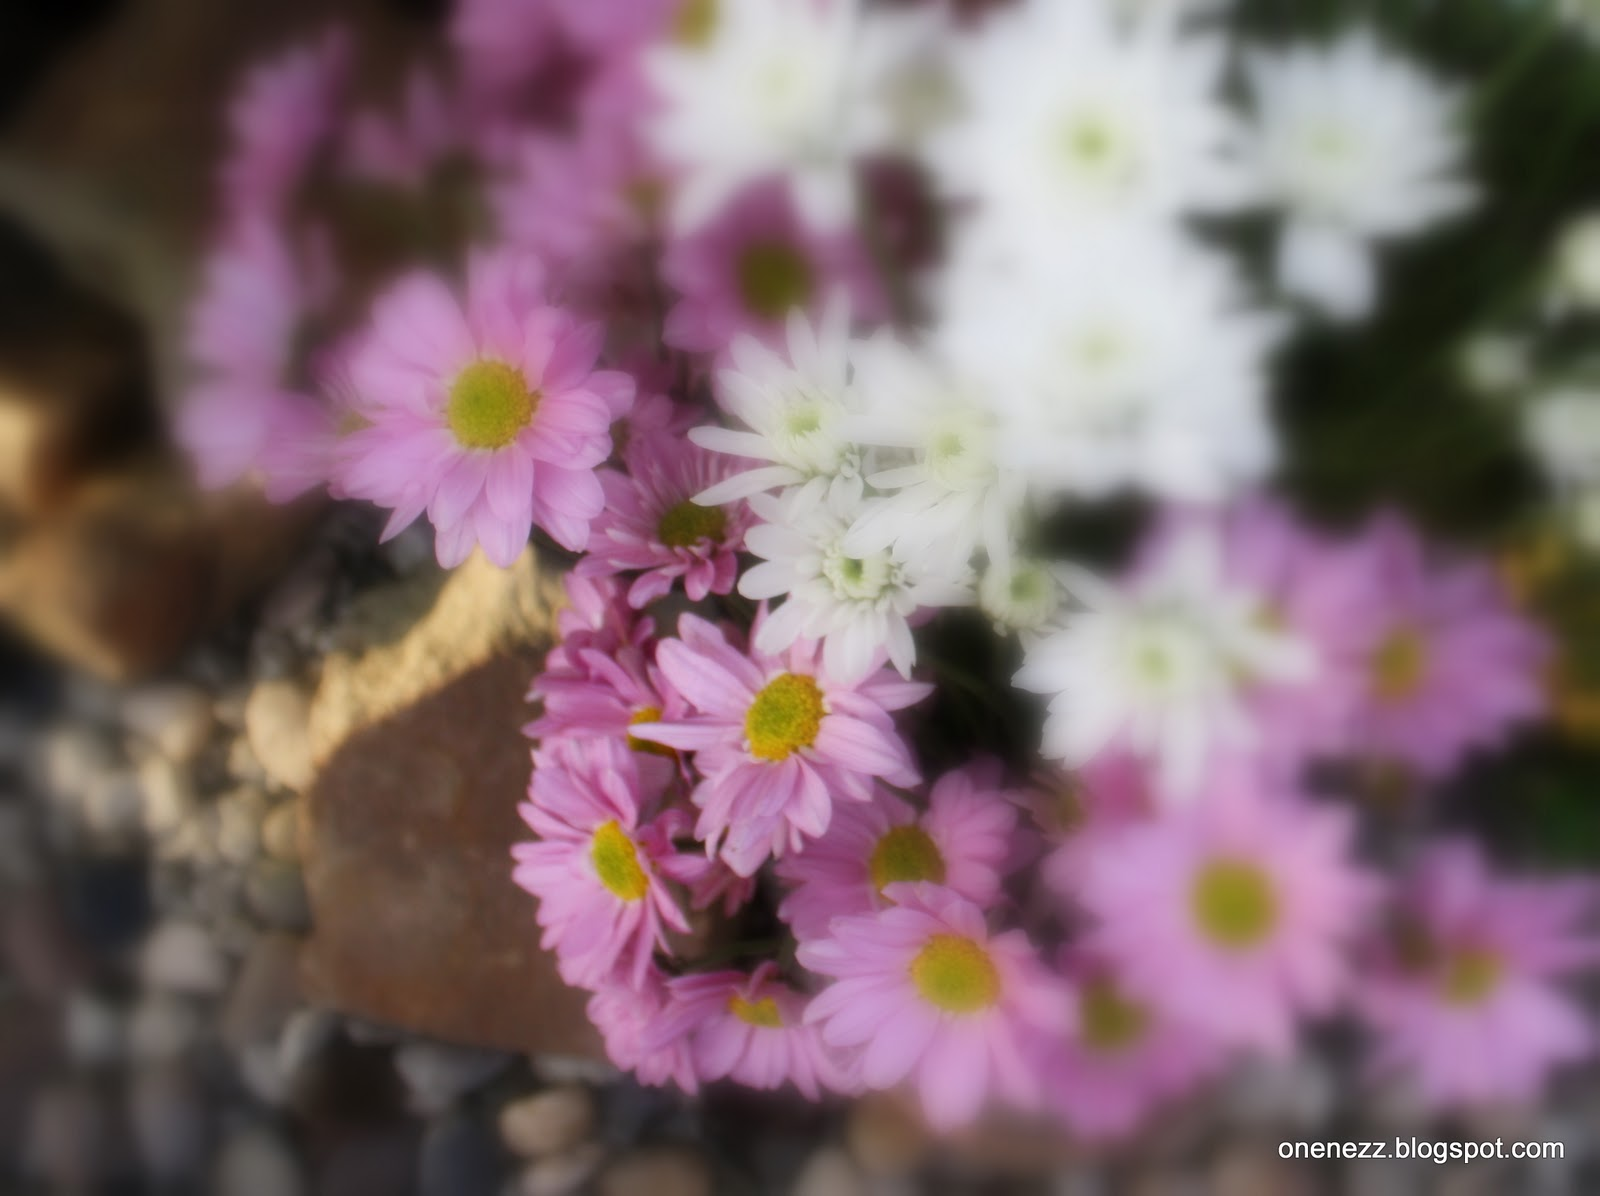 Onenezz Meaning Of Chrysanthemum